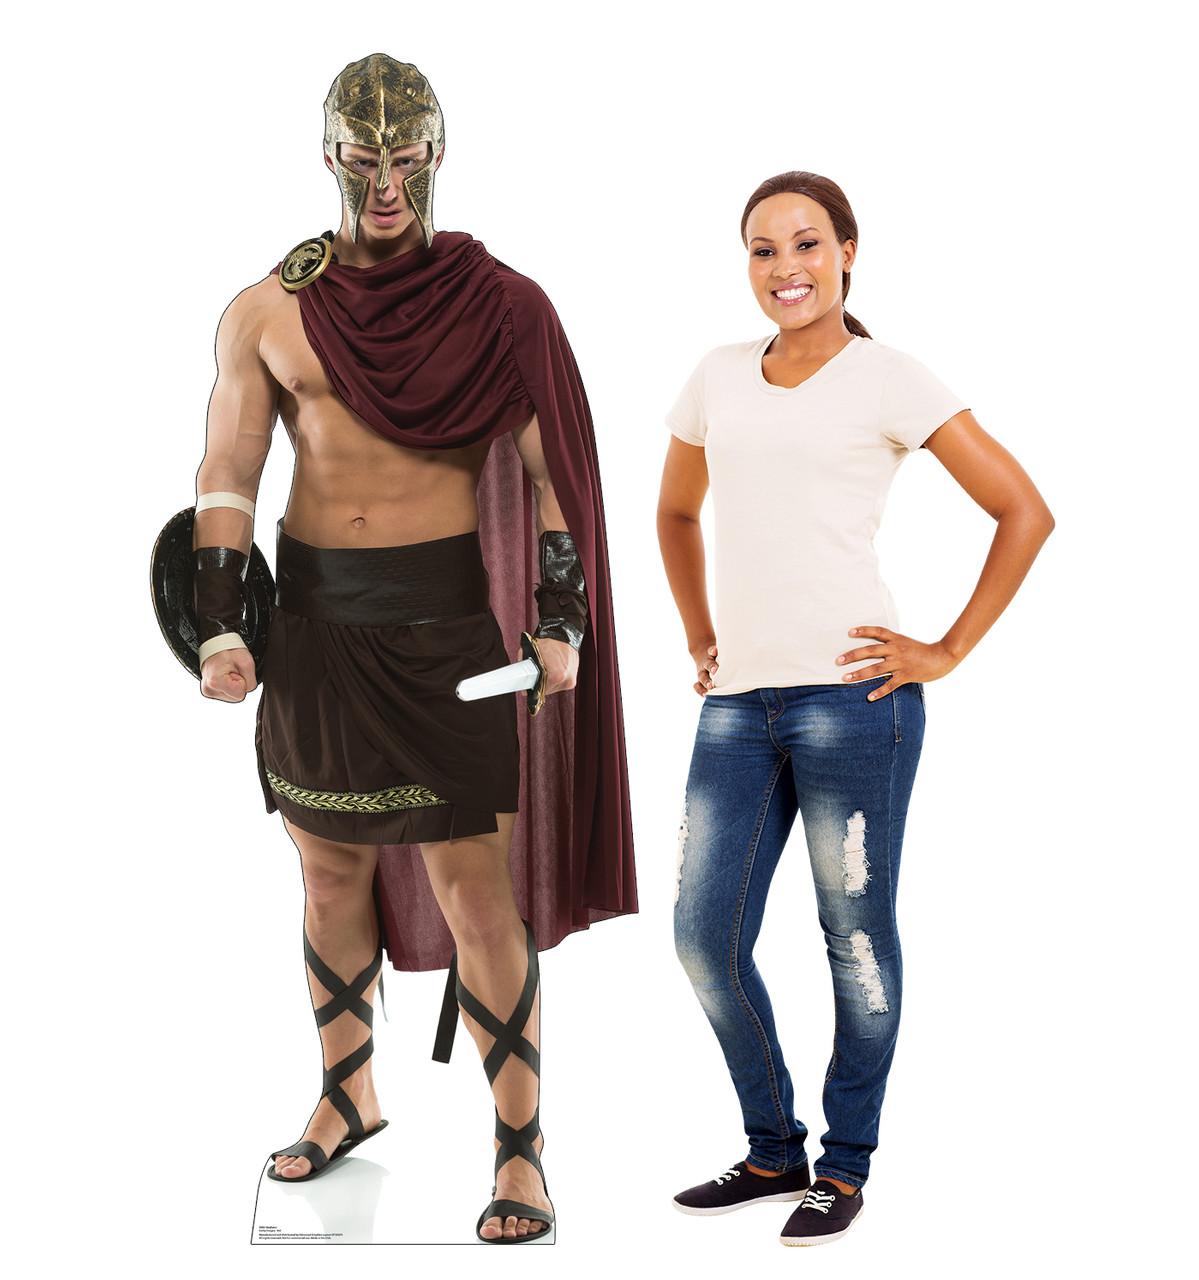 Life-size cardboard standee of a Gladiator Lifesize